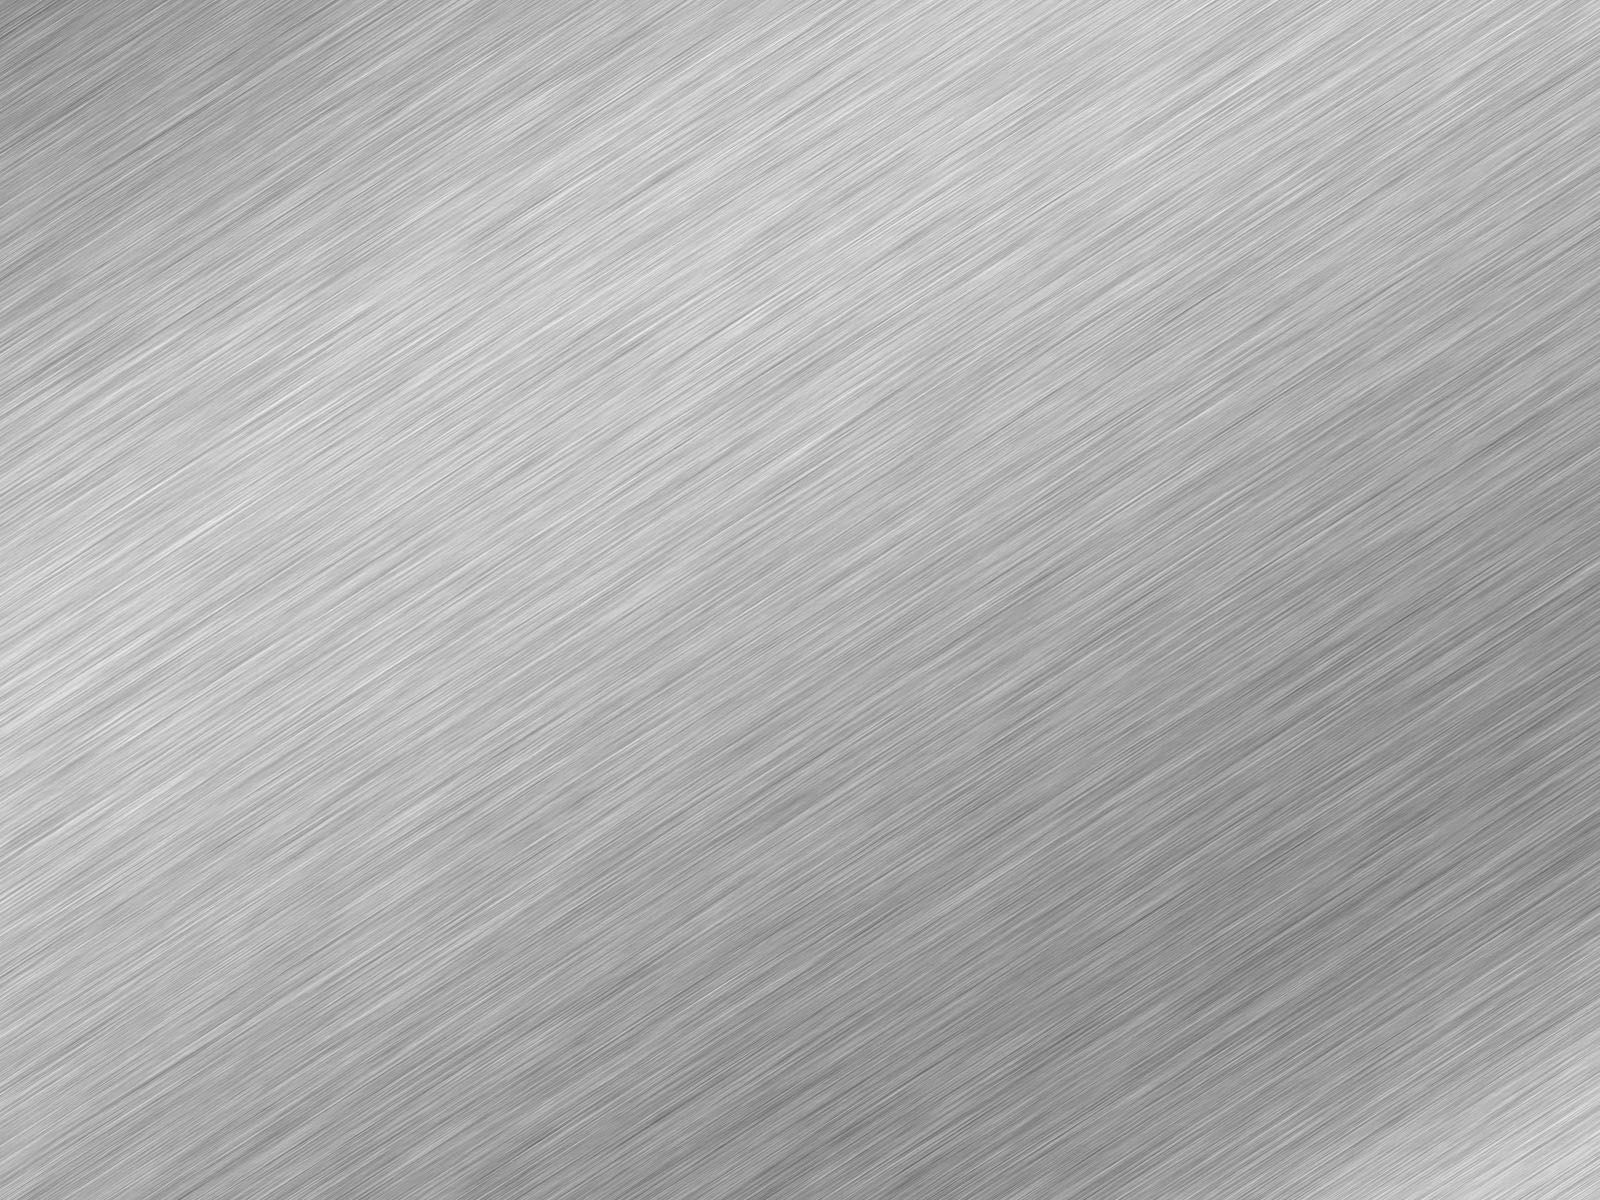 stainless steel wallpaper sf